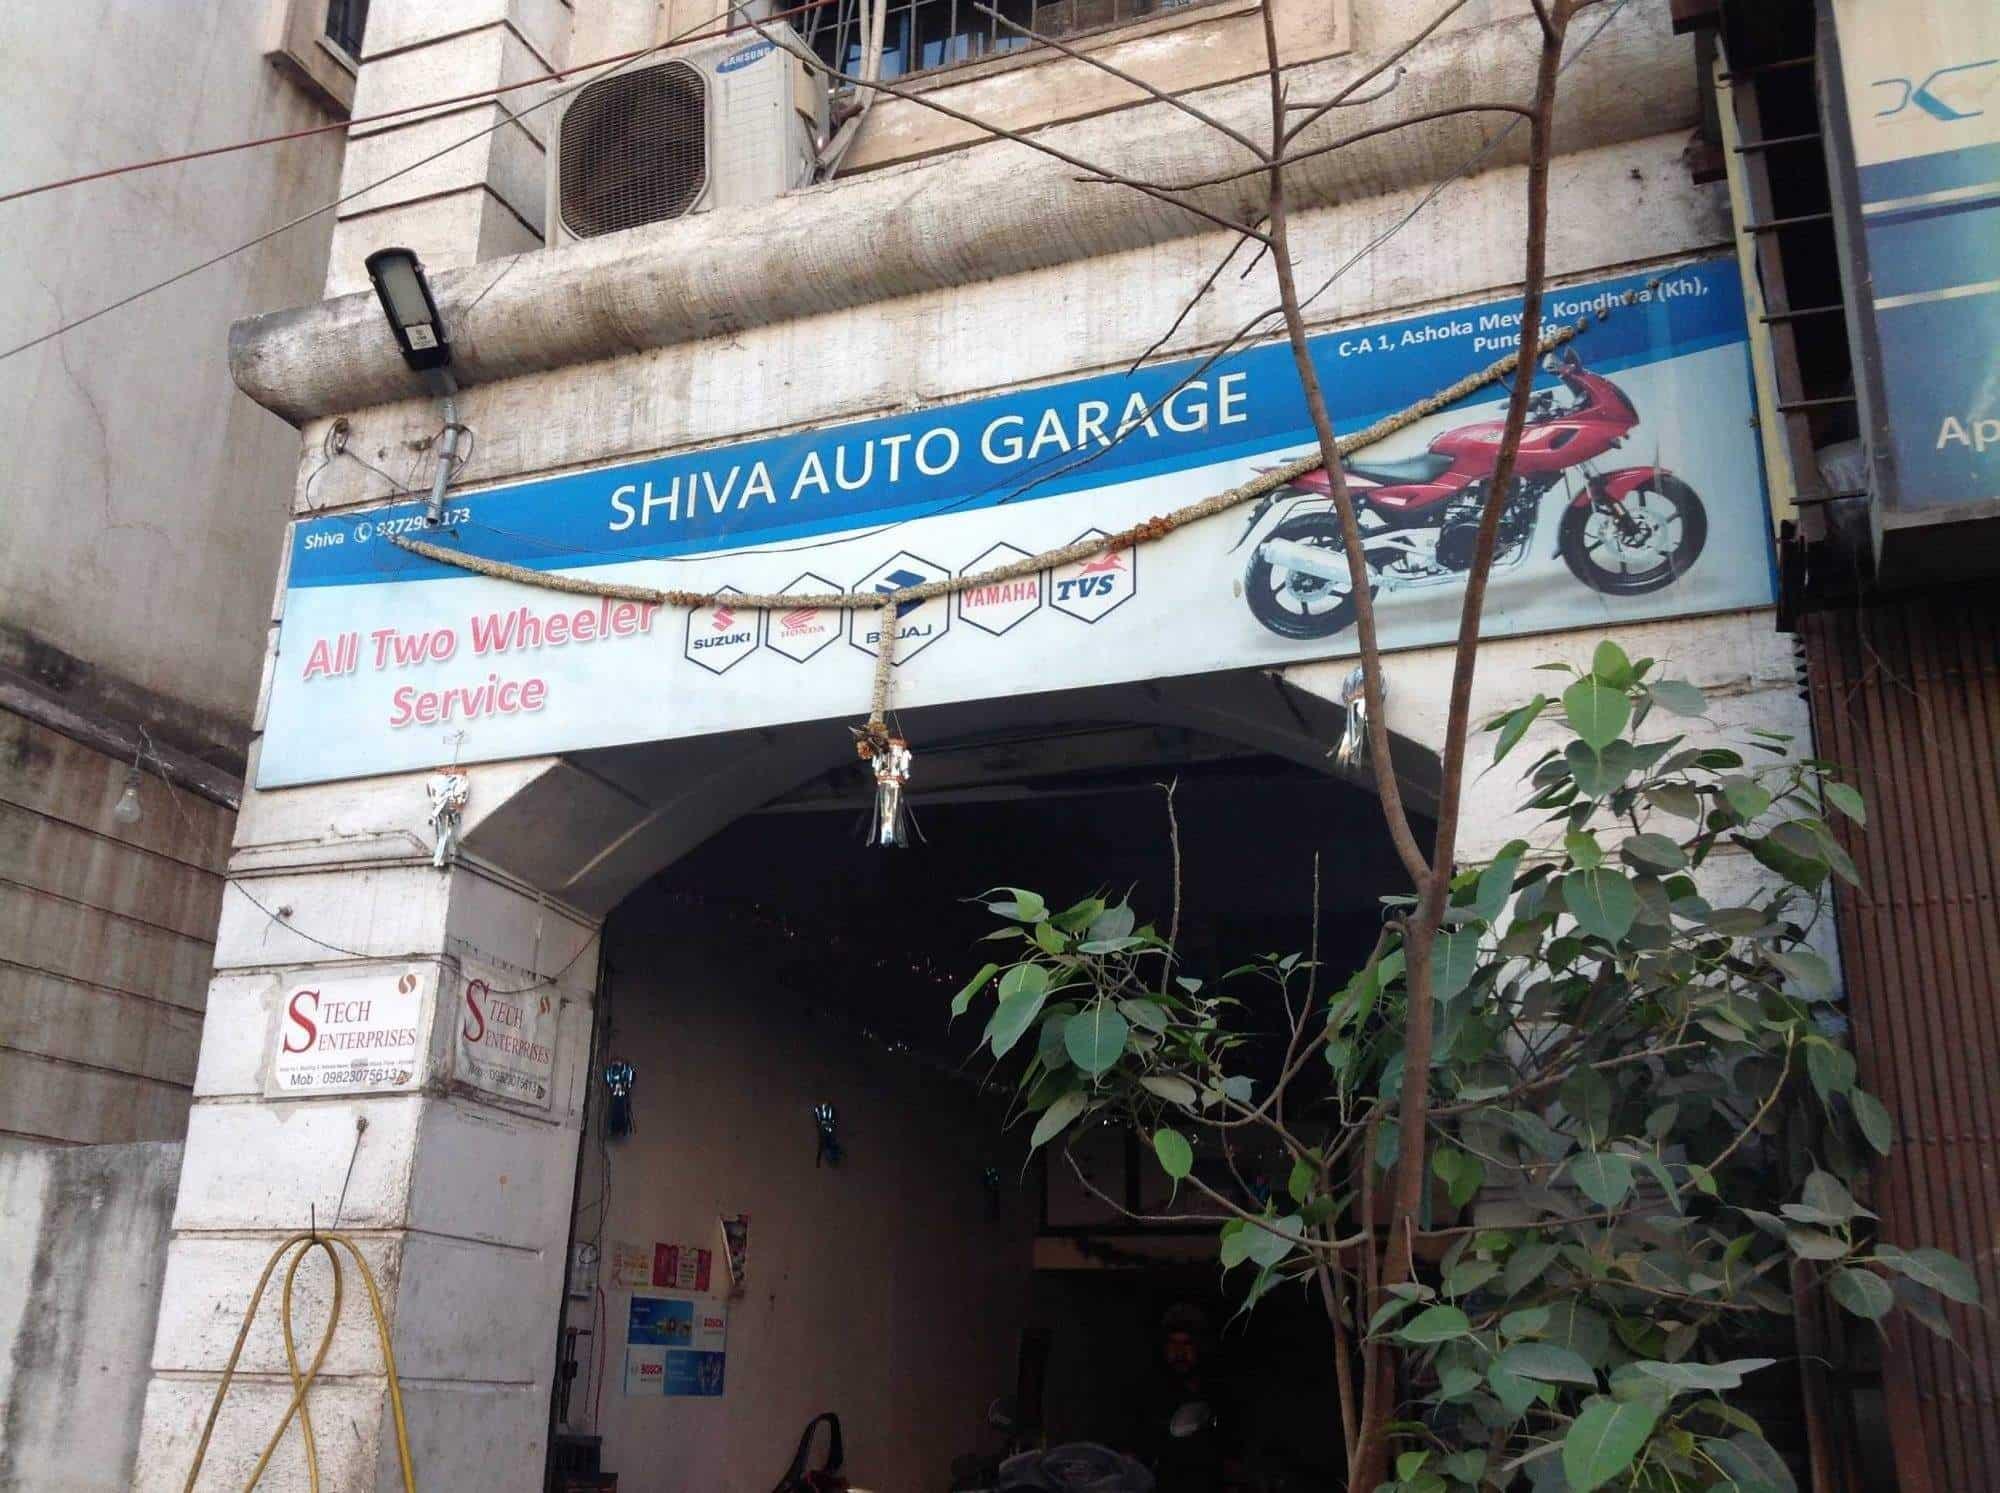 Shiva Auto Garage, Kondhwa Khurd - Garages in Pune - Justdial